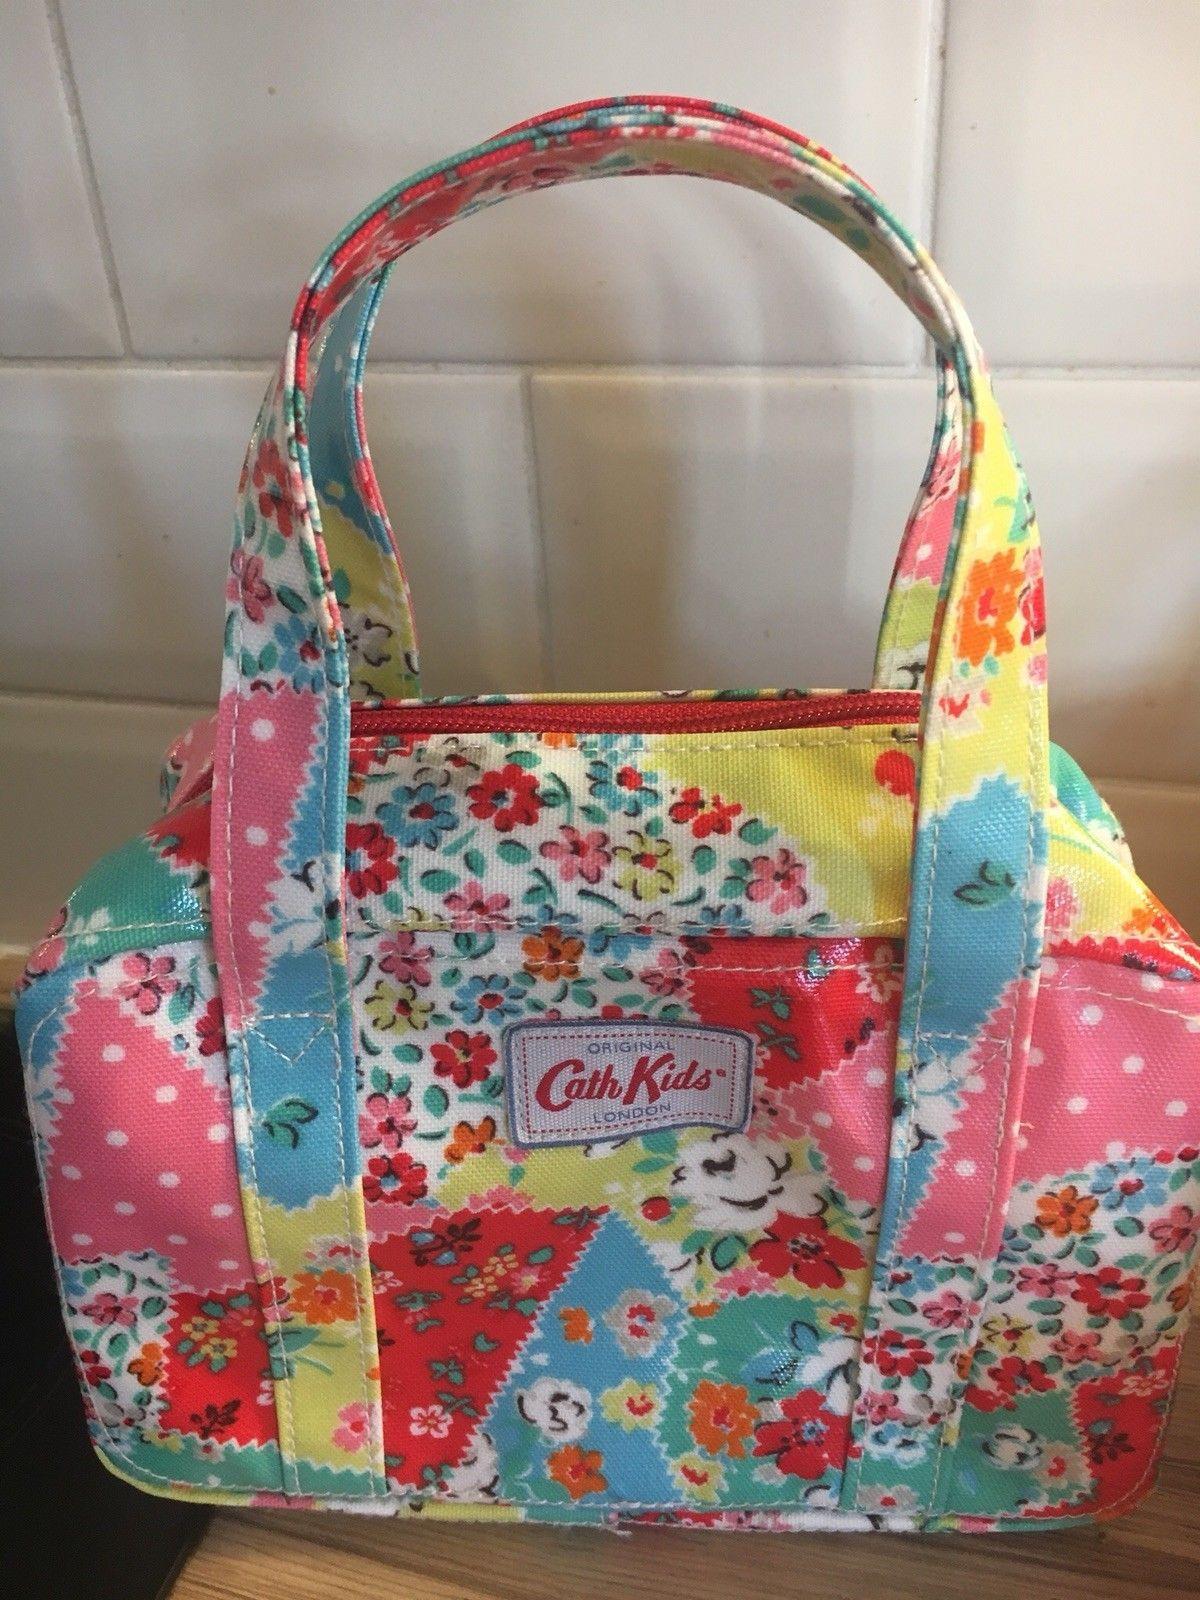 Cath Kidston Box Bags Ebay Bag